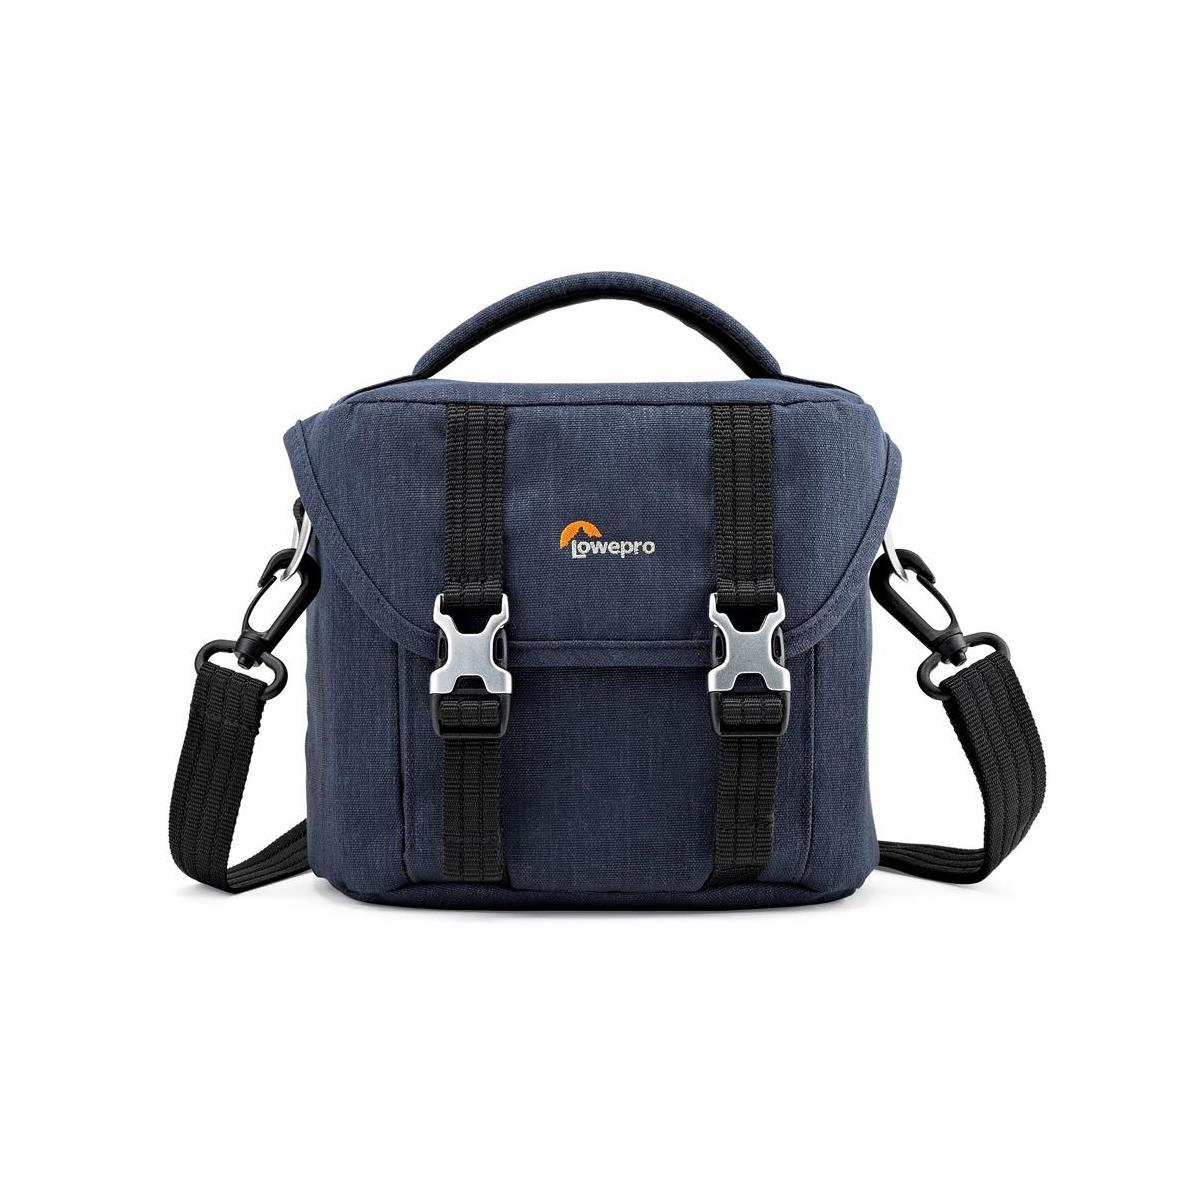 Lowepro Scout SH 120 Shoulder / Camera Bag $15 after $10 rebate + free shipping